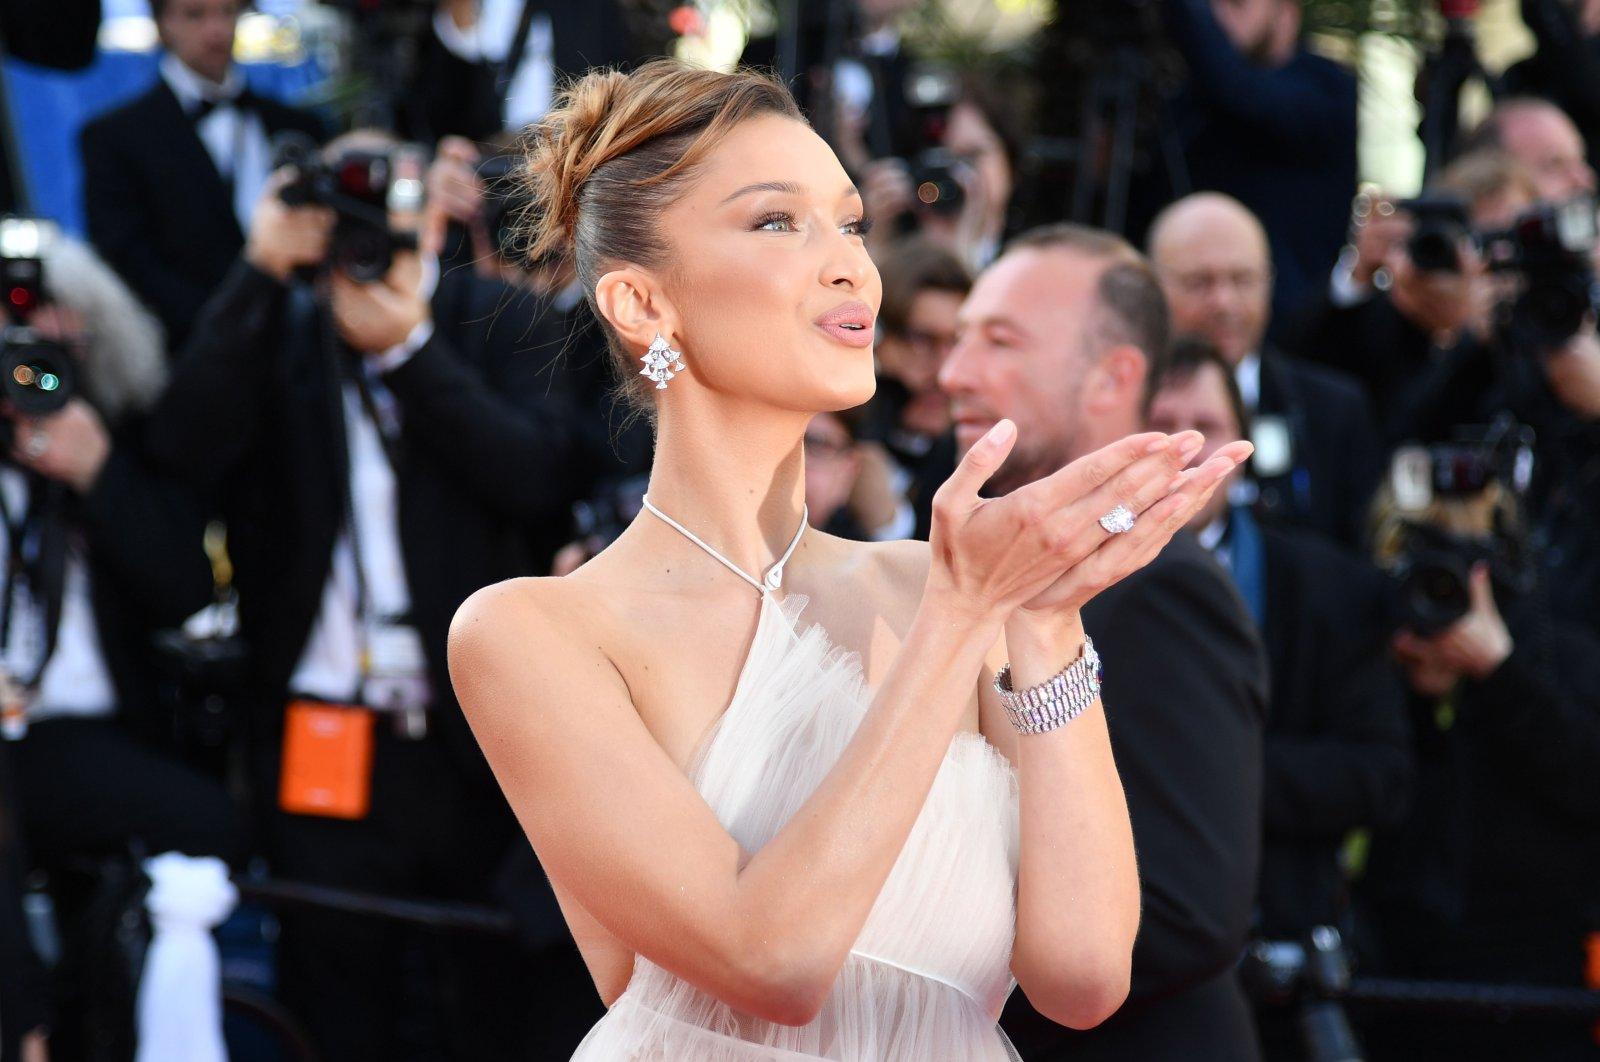 U.S. model Bella Hadid at Cannes Film Festival. (AFP Photo)